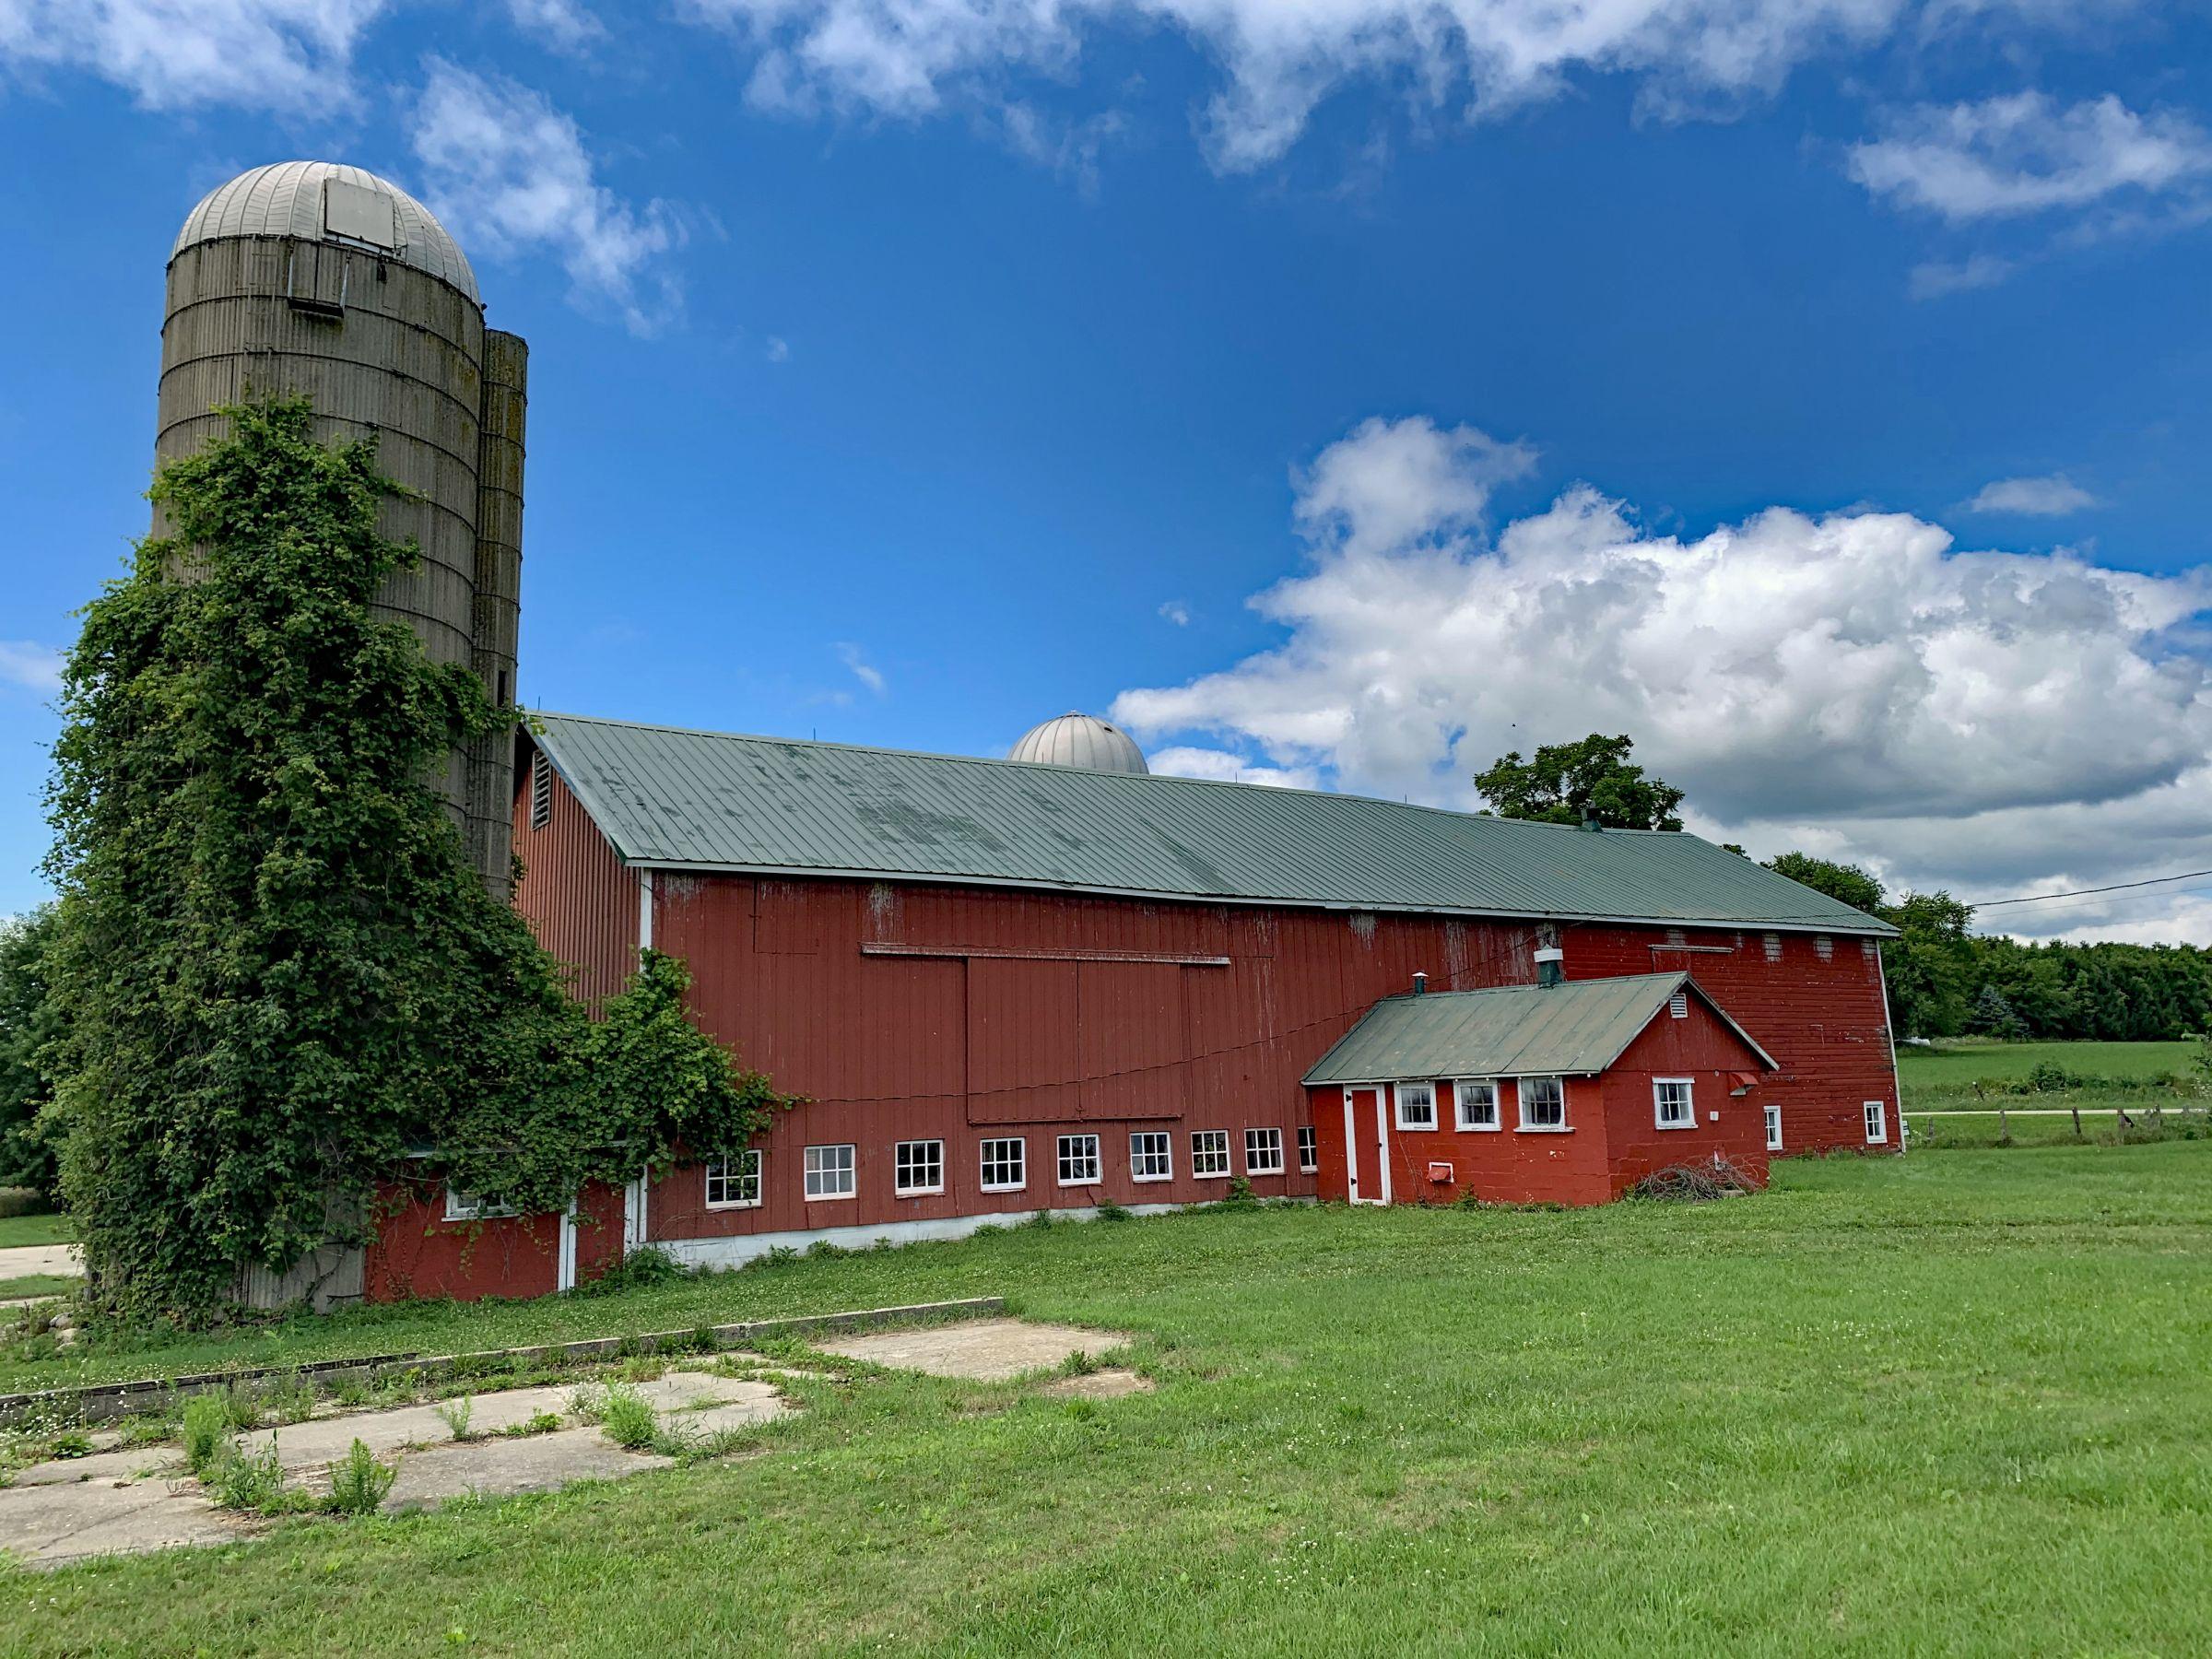 land-winnebago-county-illinois-127-acres-listing-number-15094-4-2020-08-03-160426.jpg